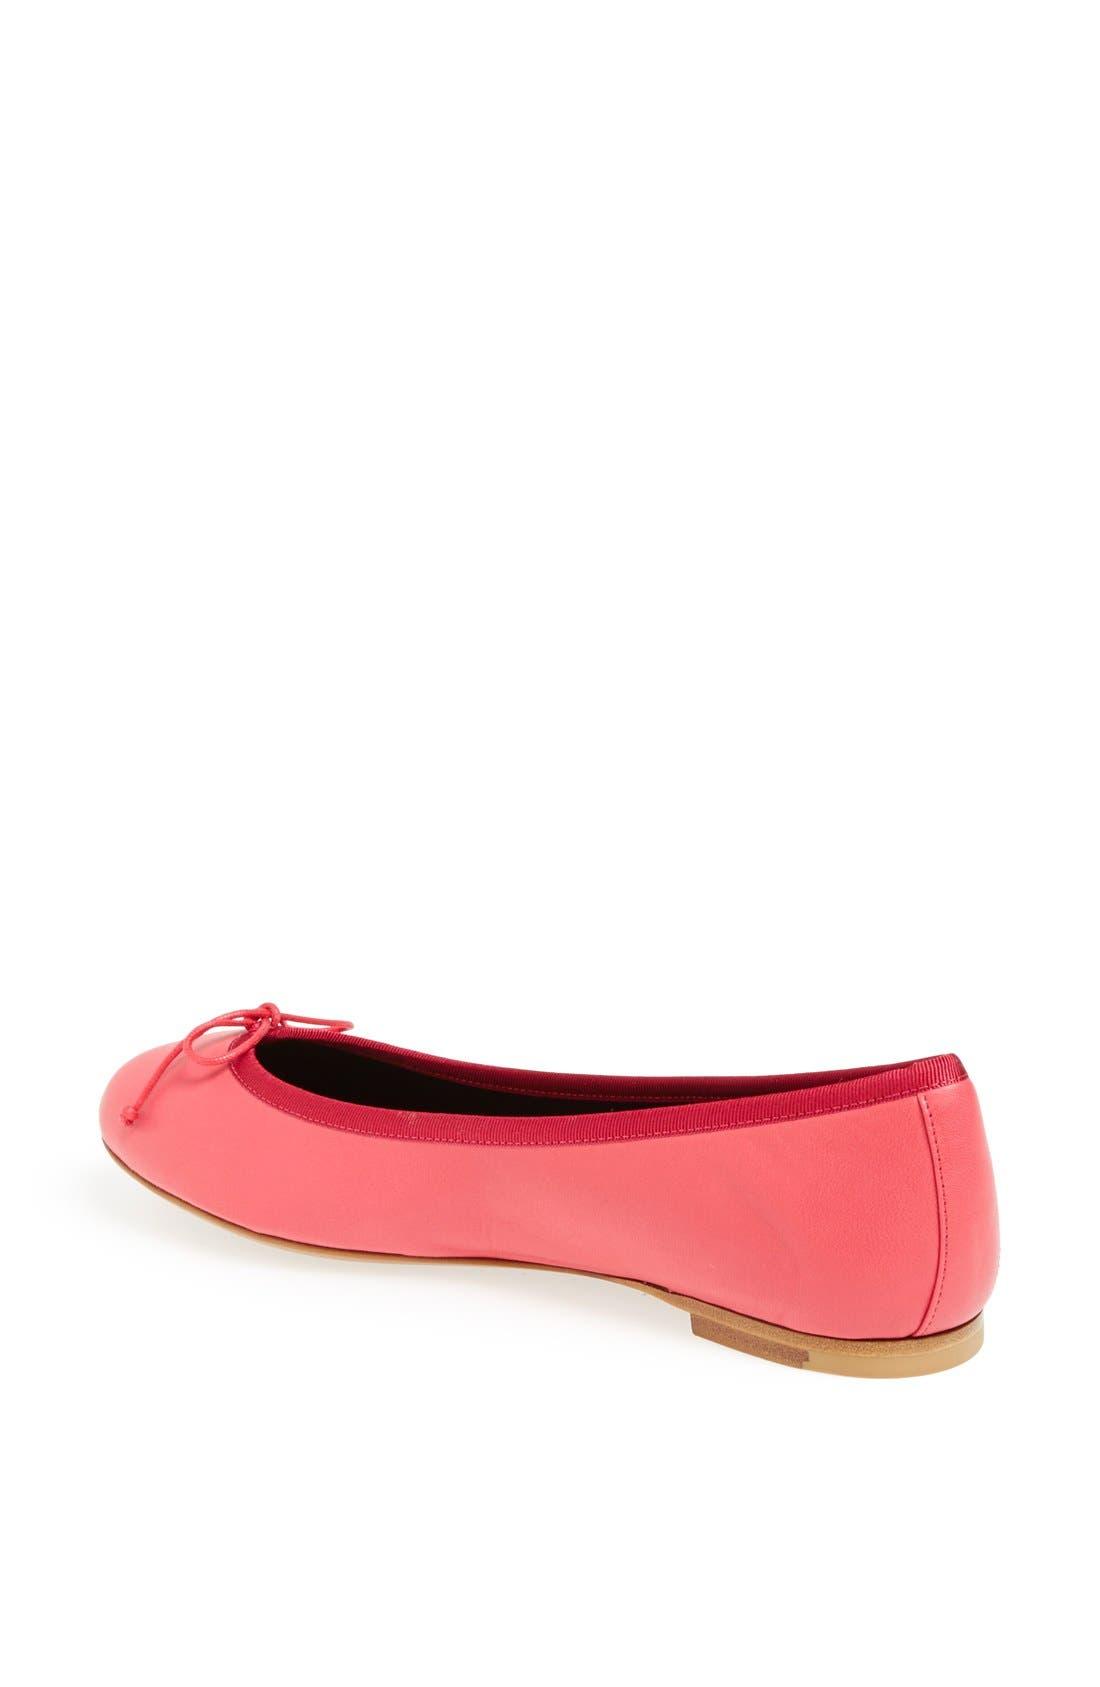 Alternate Image 3  - Saint Laurent 'Dance' Leather Ballet Flat